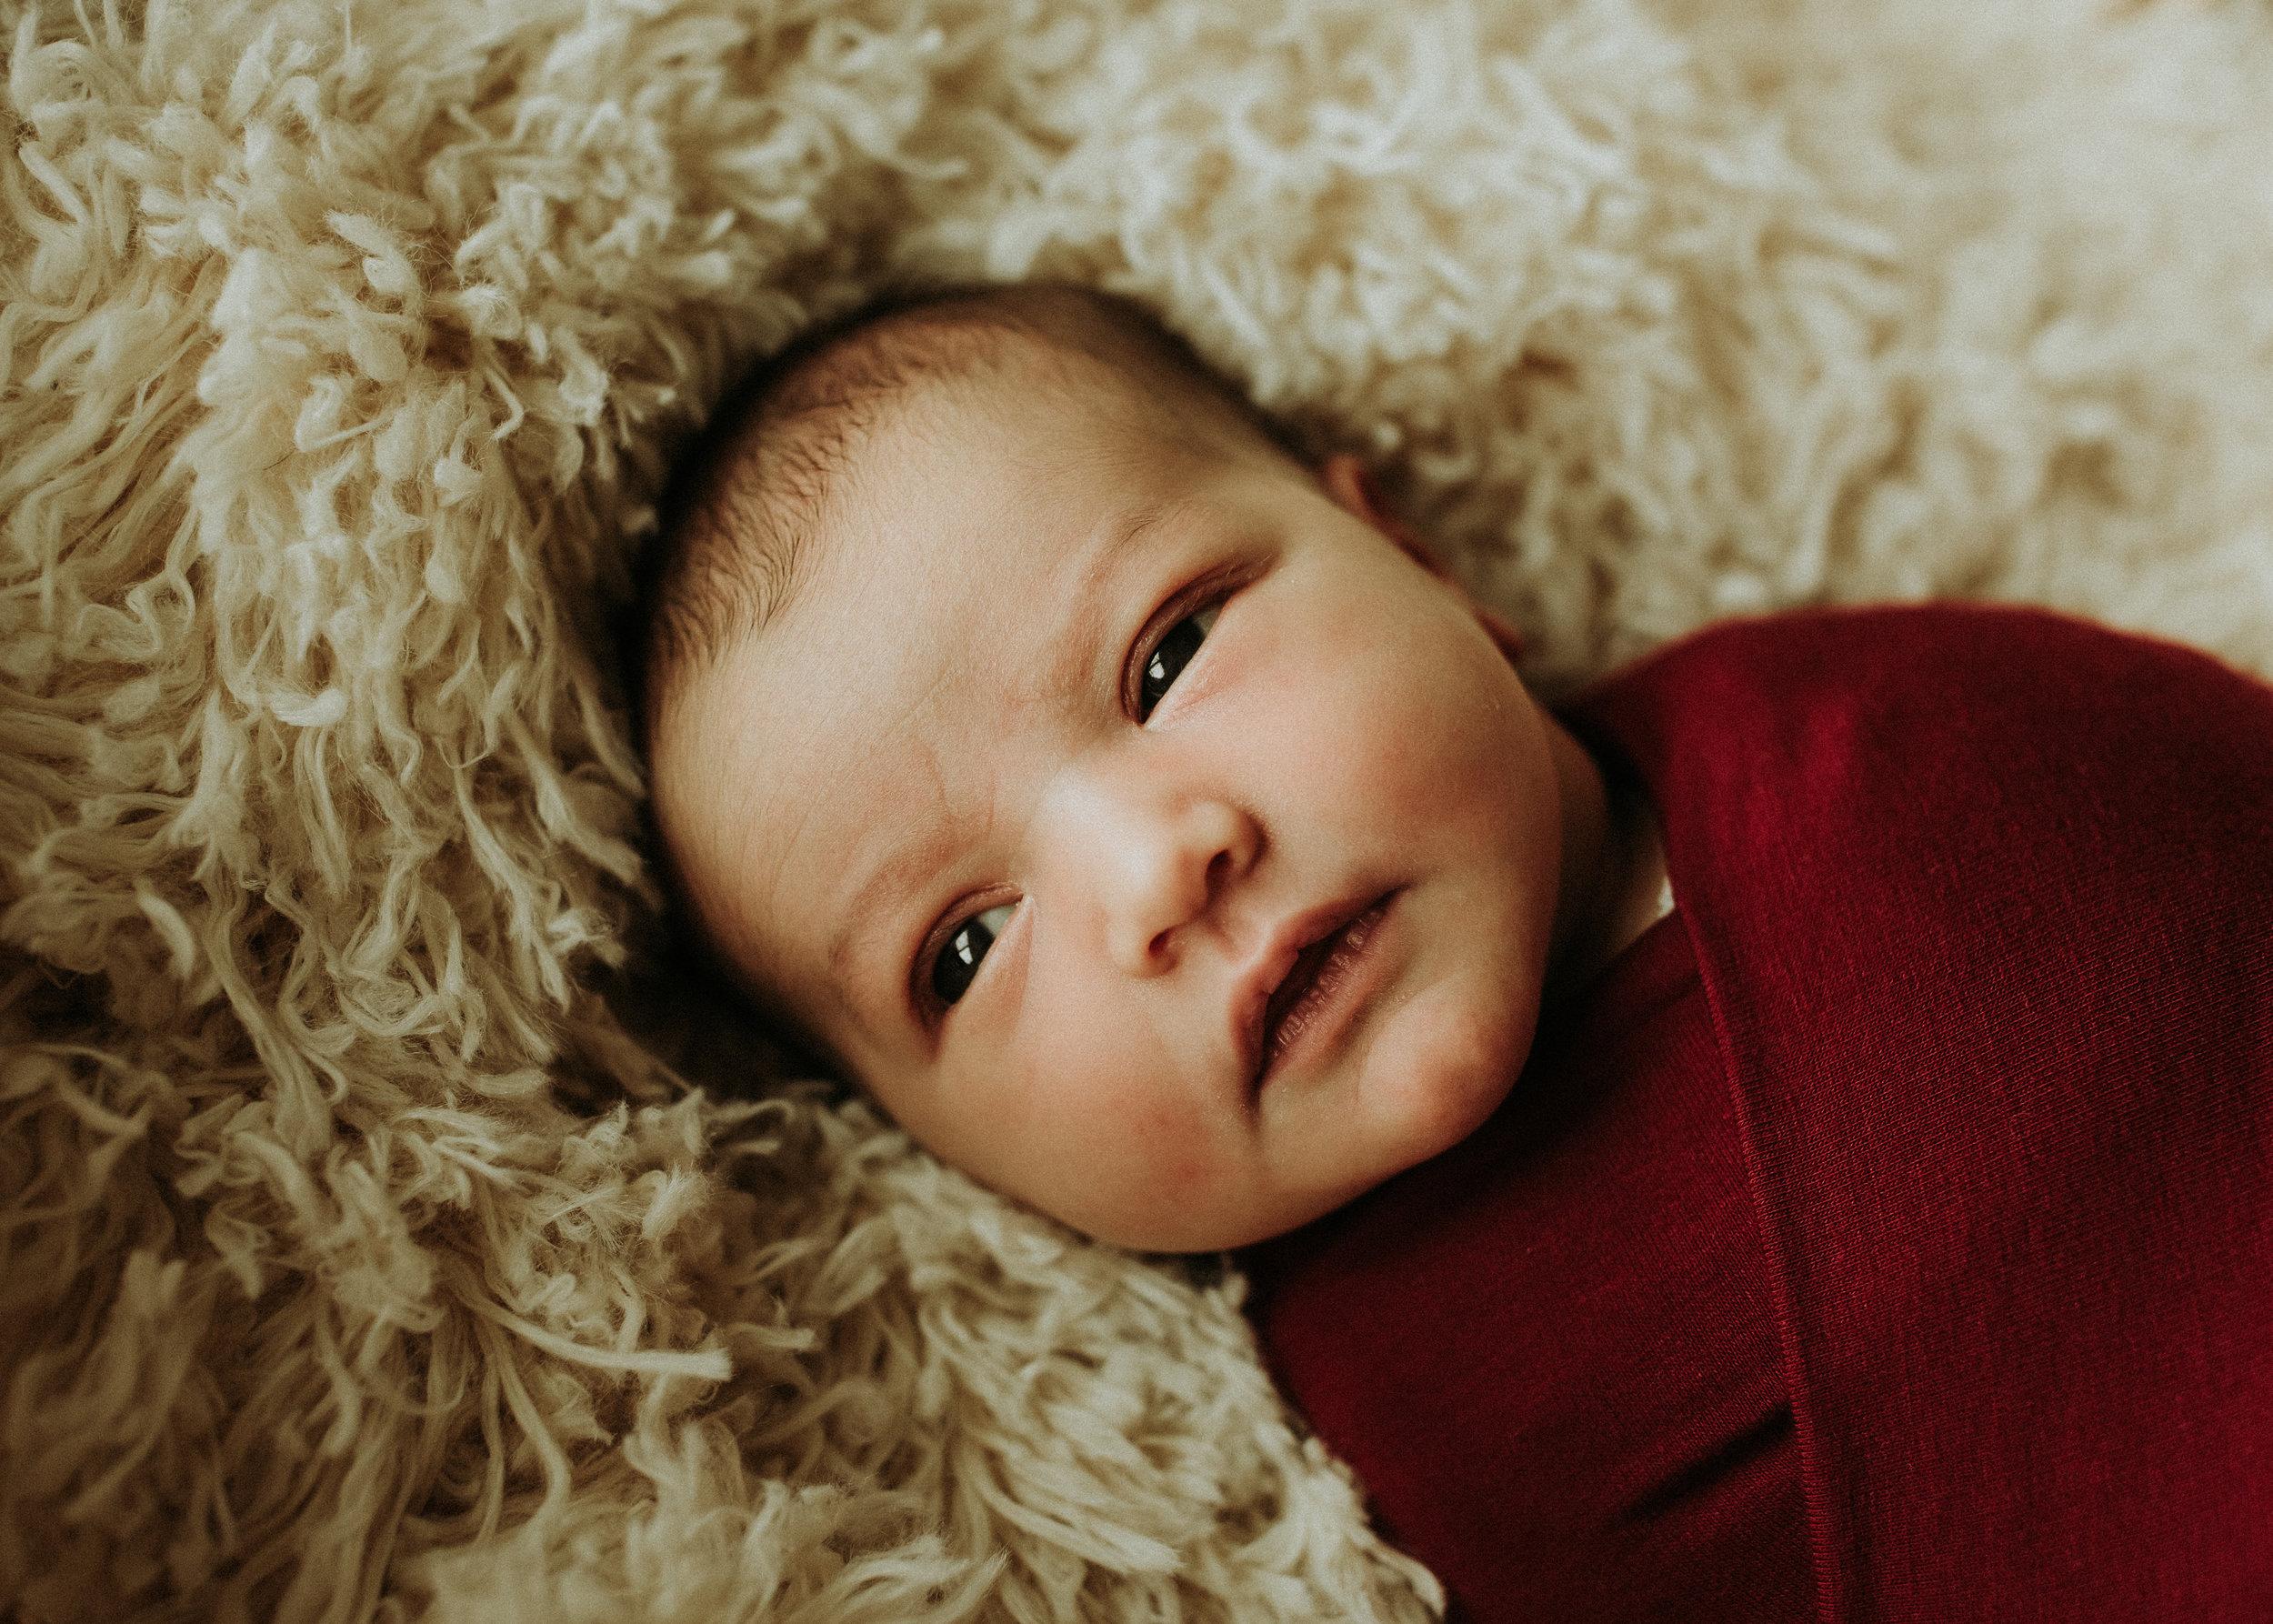 Newborn-Photographer-Bellingham-WA-Brianne-Bell-Photograpy-(Ila)-16.jpg